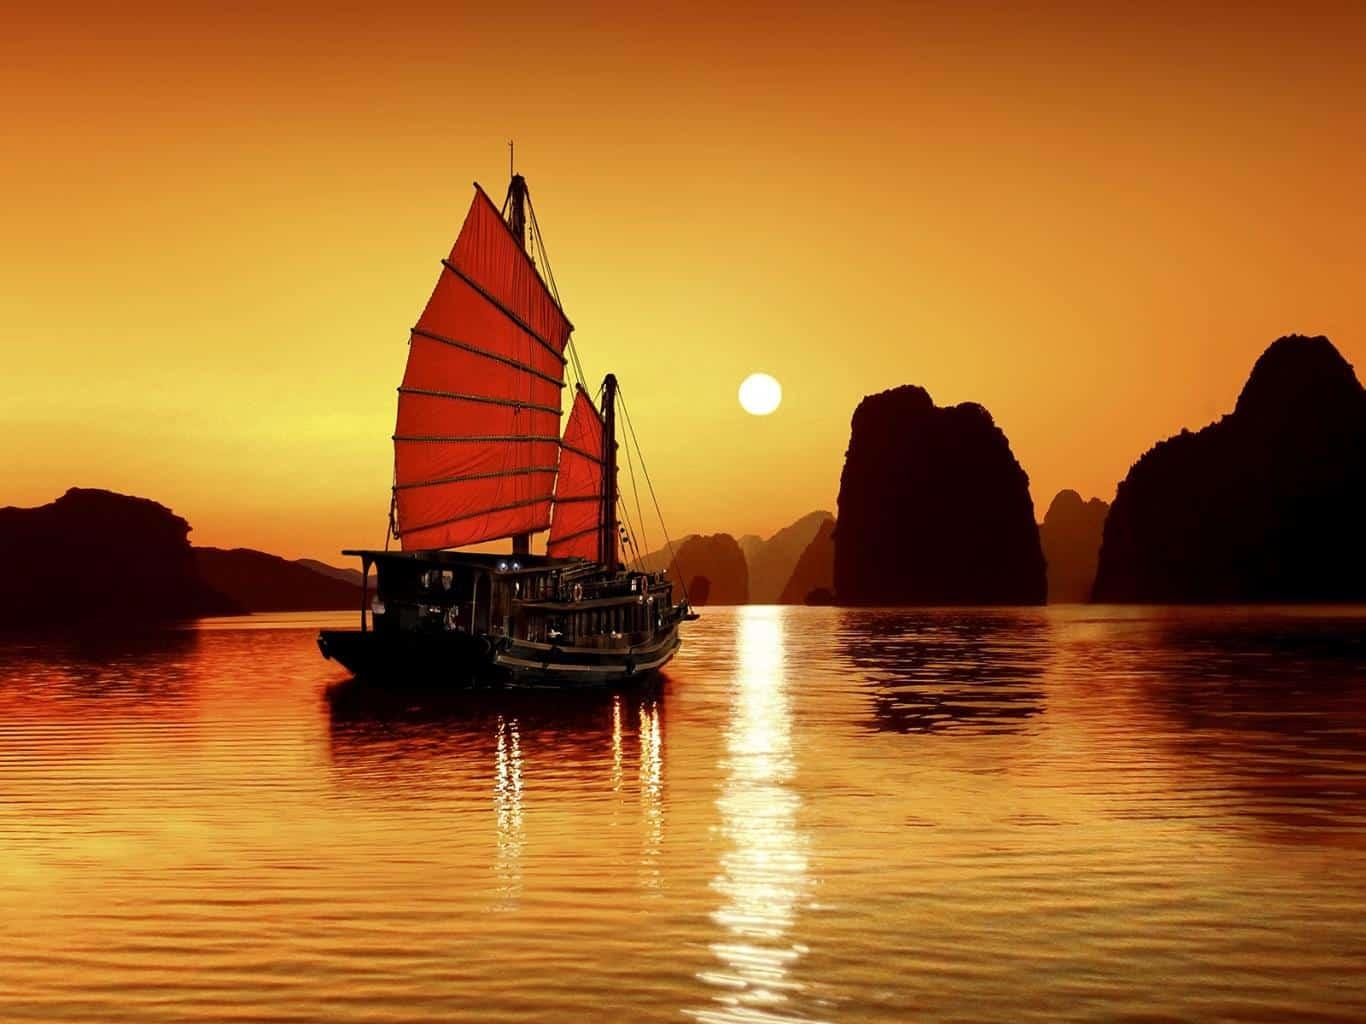 Thuyền buồm Hạ Long